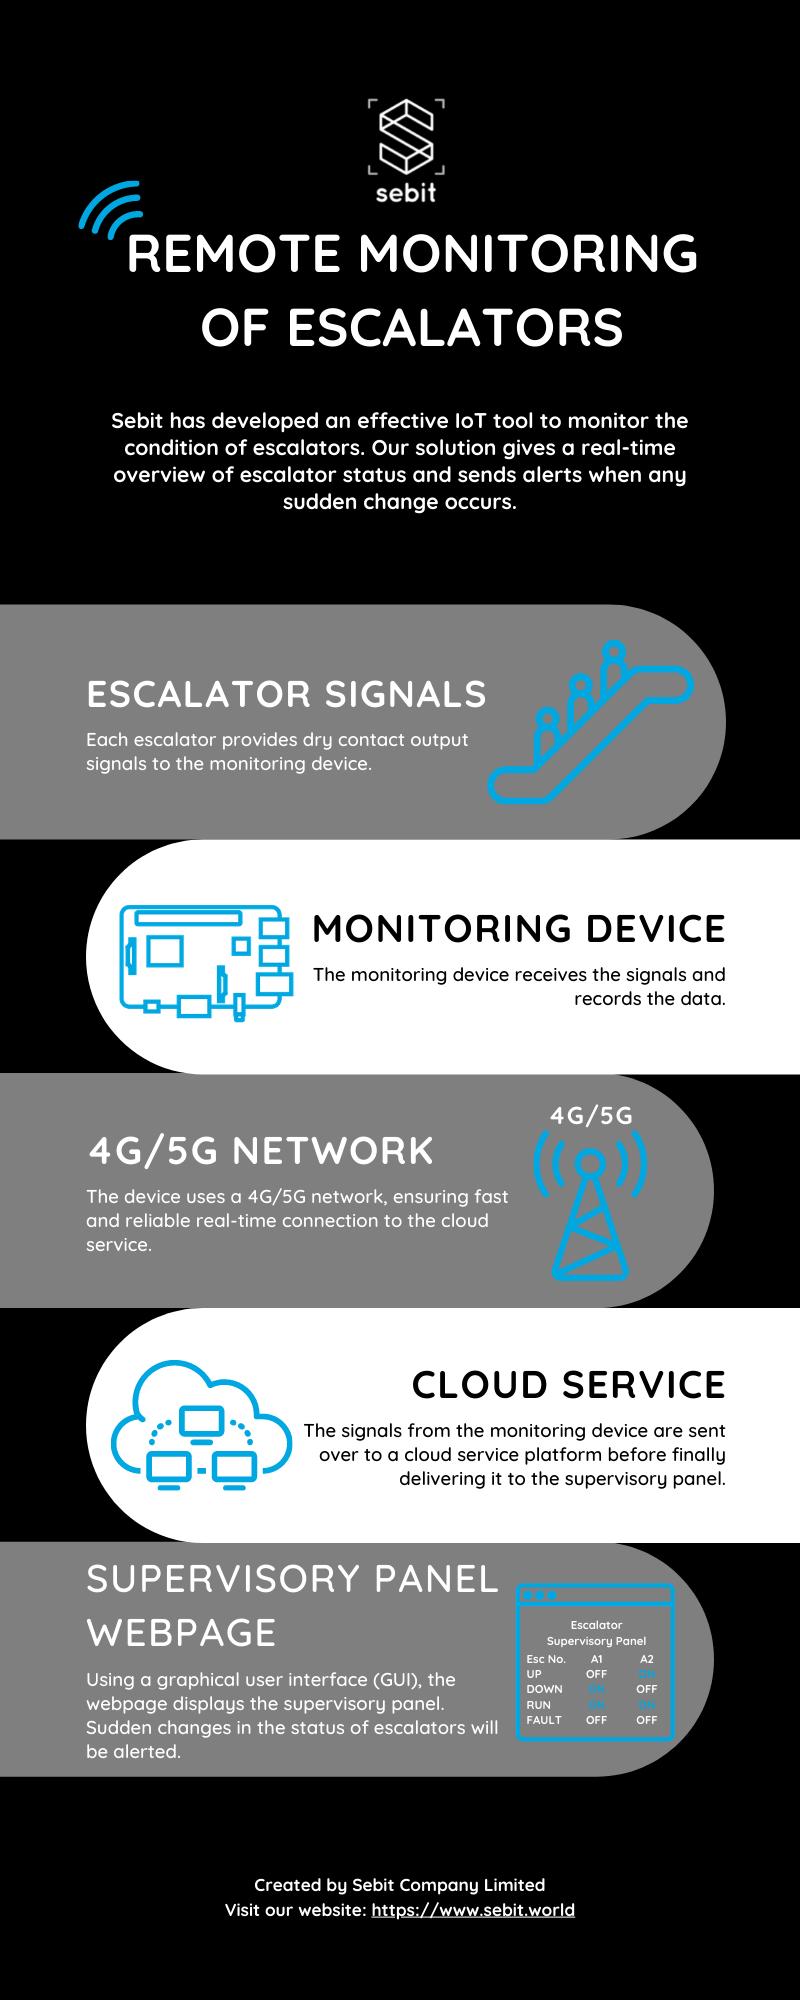 Sebit Remote Monitoring of Escalators Infographic